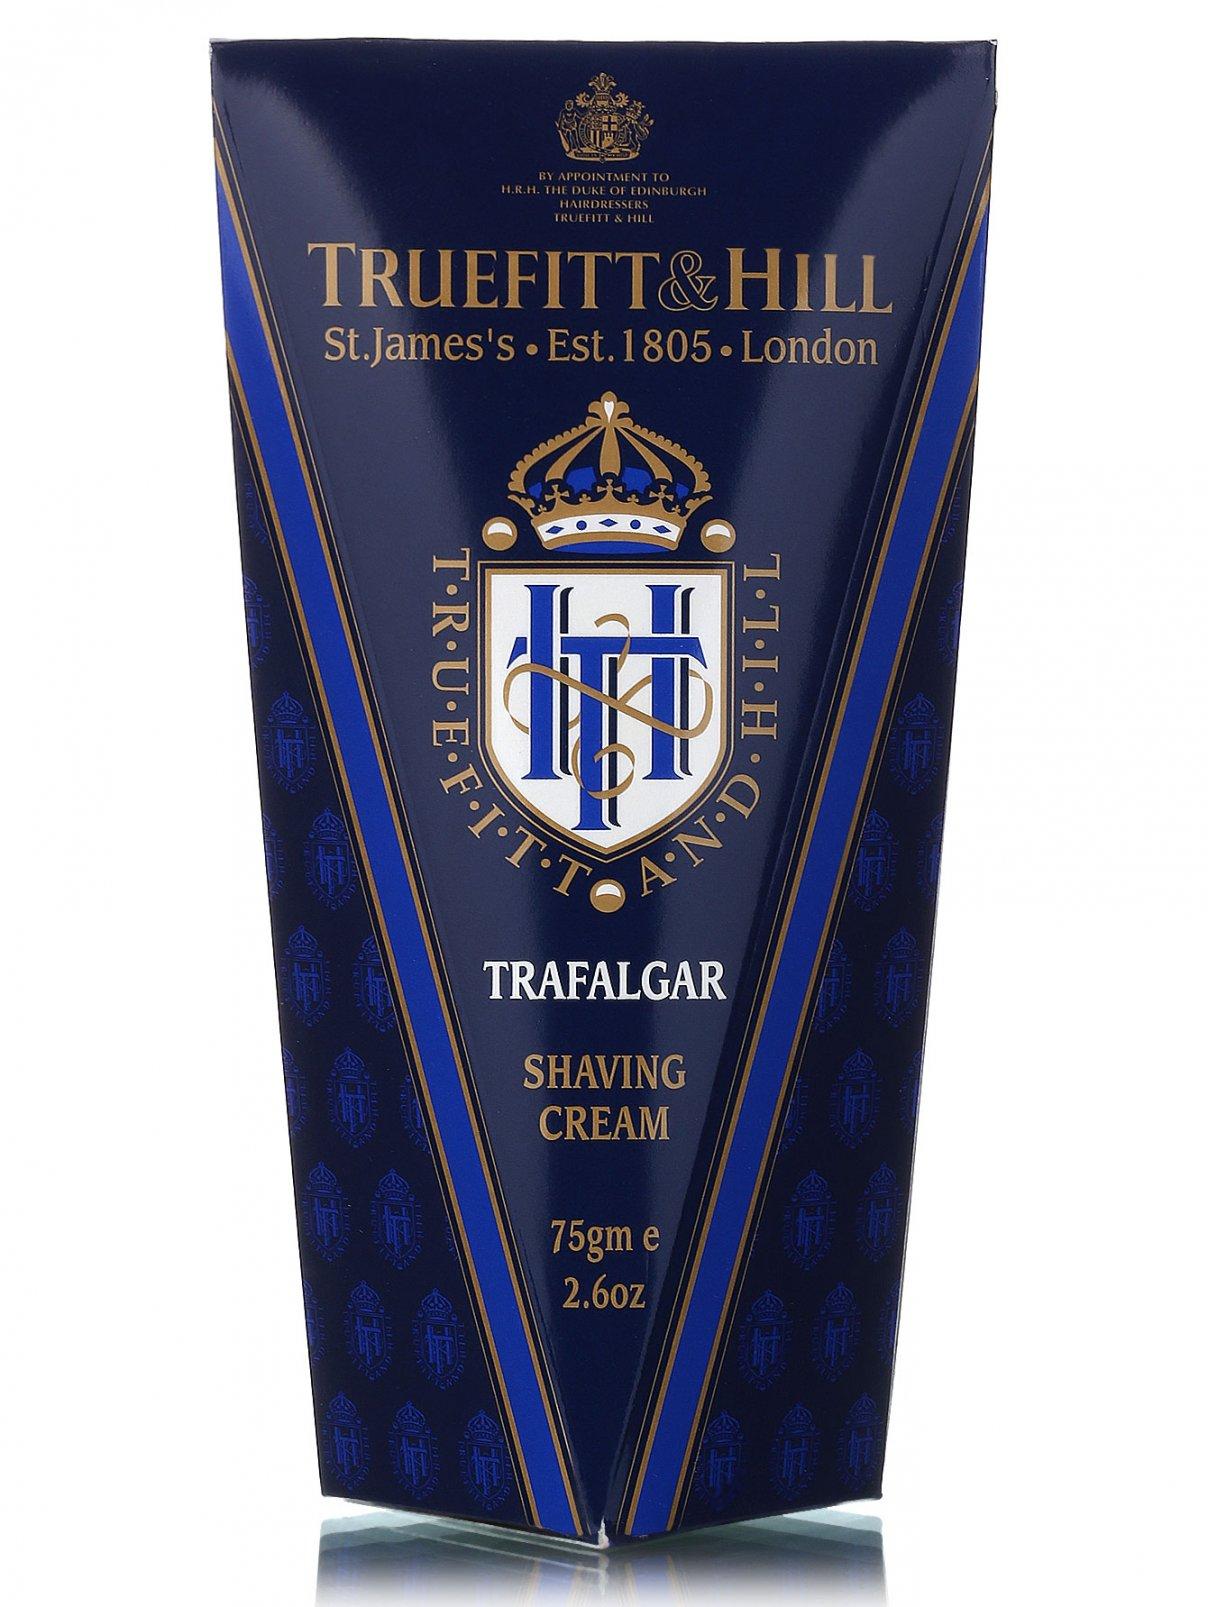 Крем для бритья - Trafalgar shaving cream Truefitt & Hill  –  Модель Общий вид